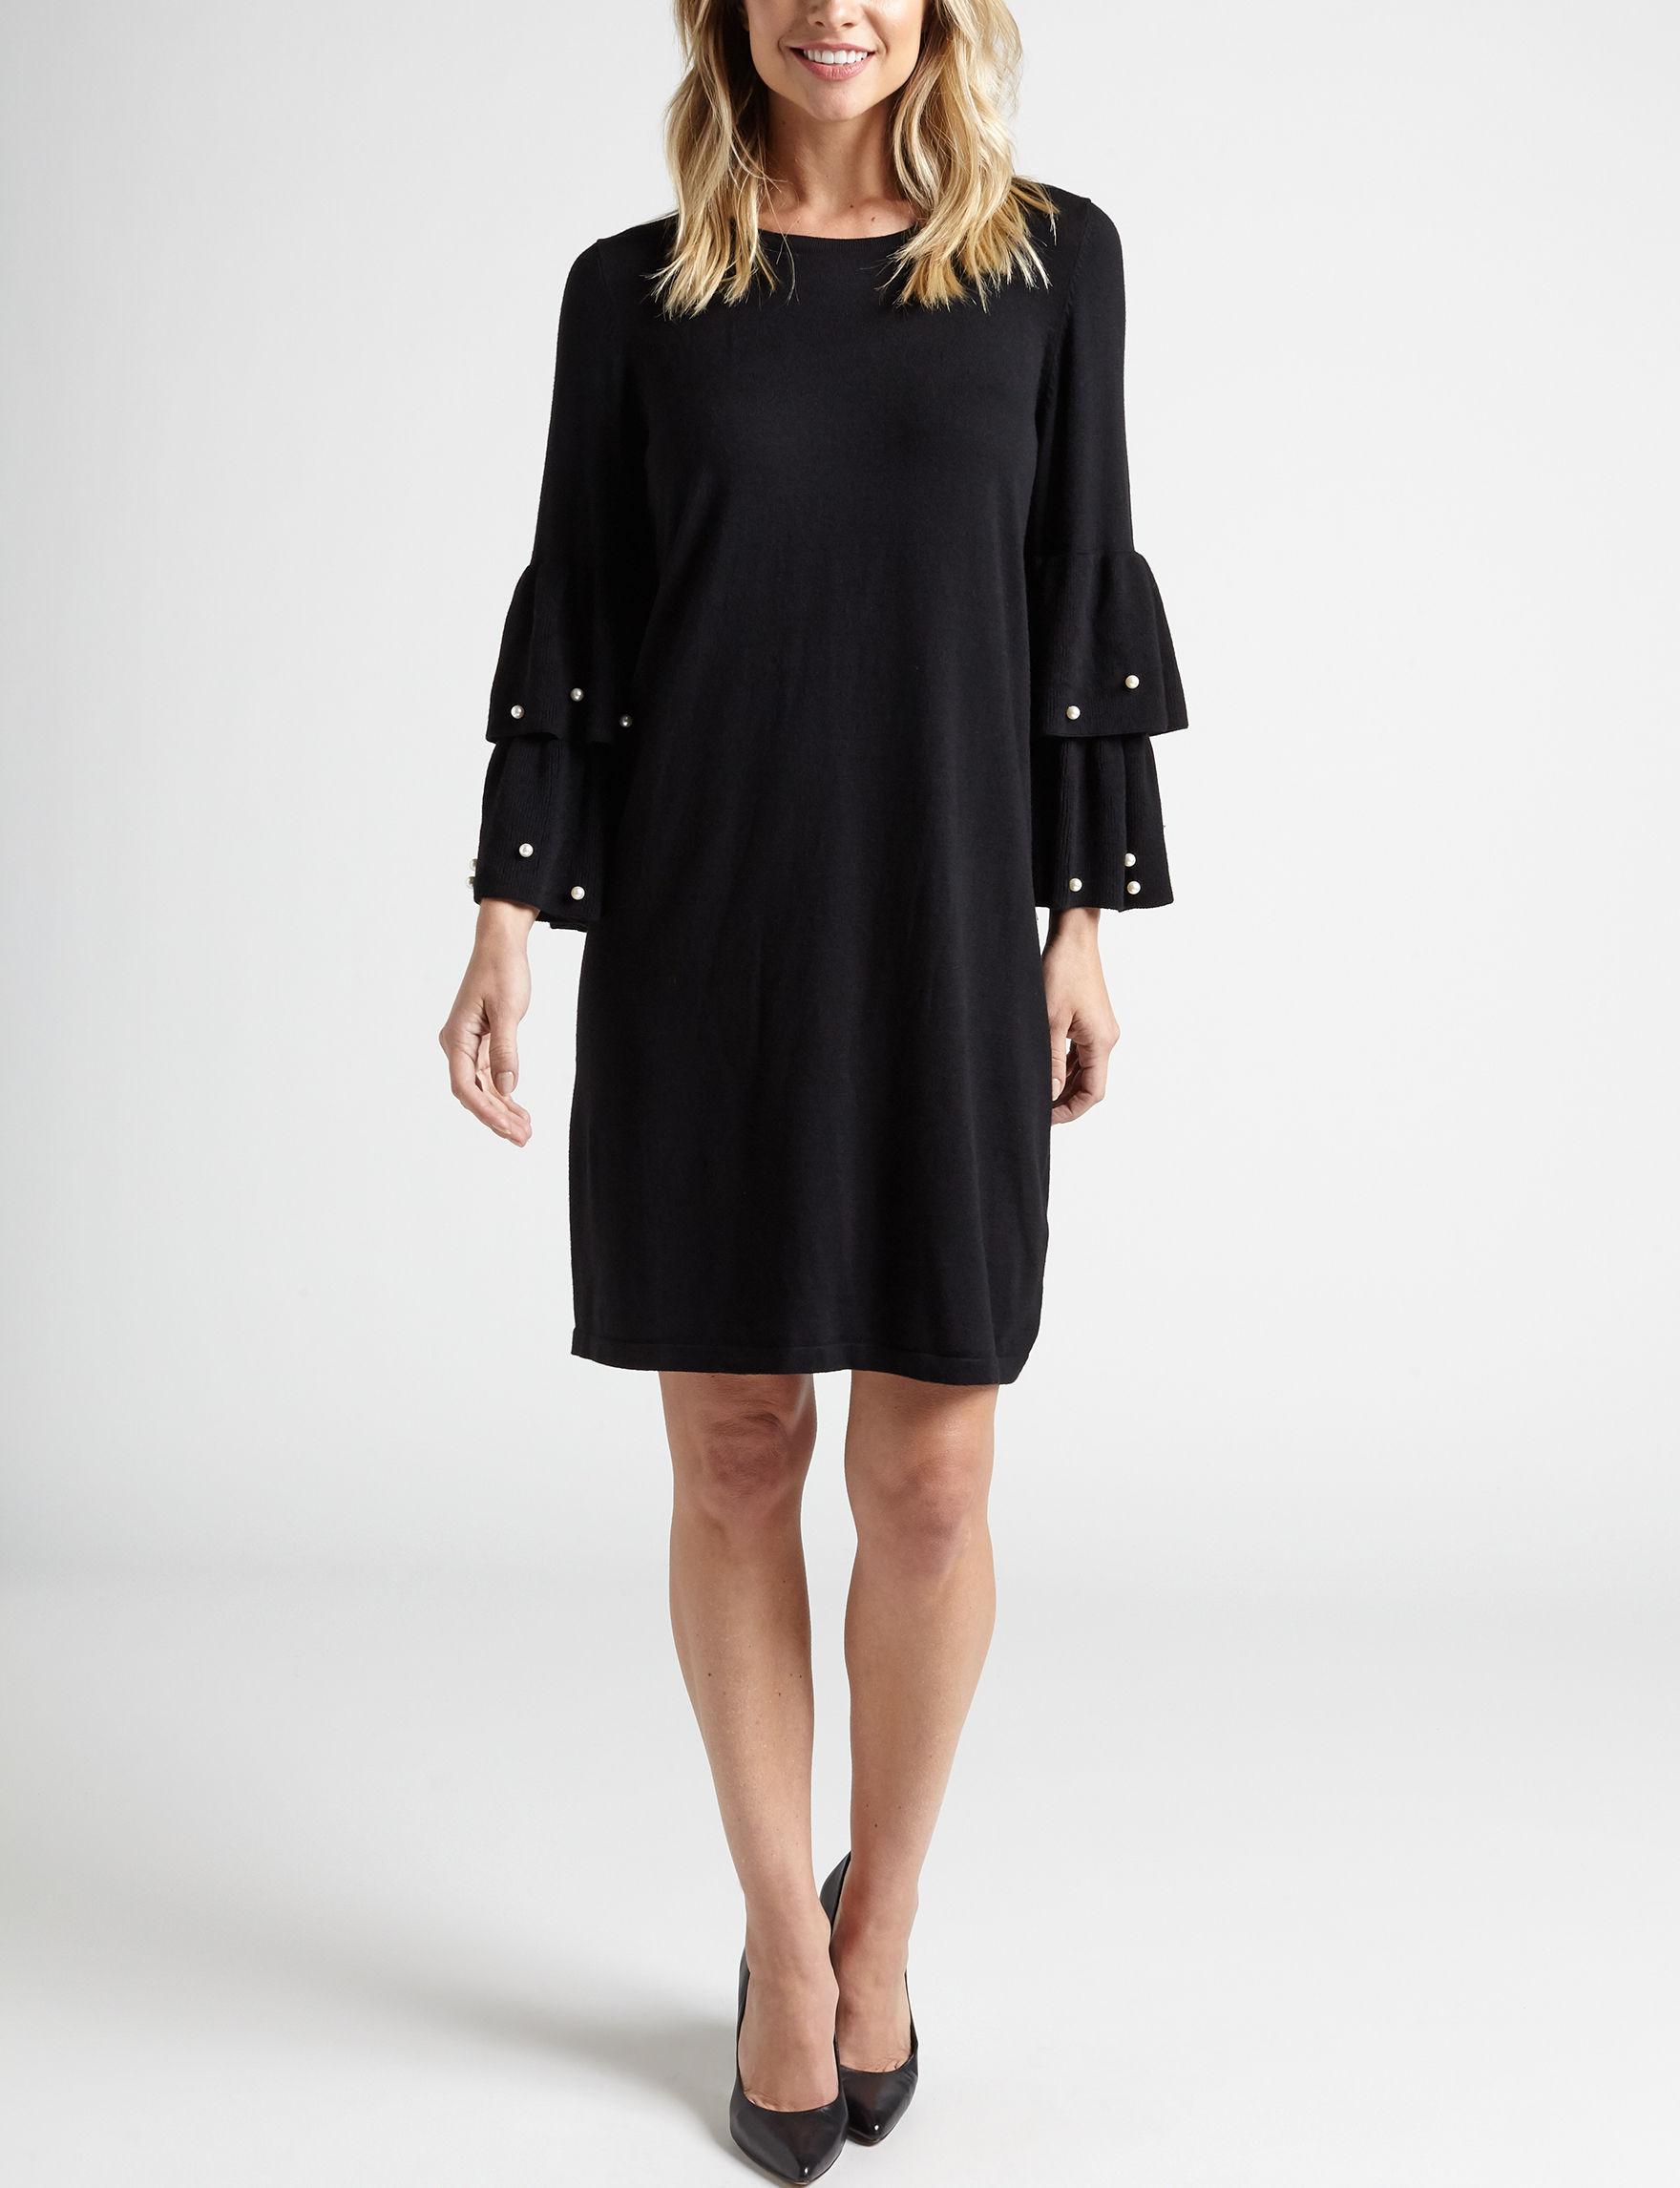 Harlow & Rose Black Everyday & Casual Sweater Dresses